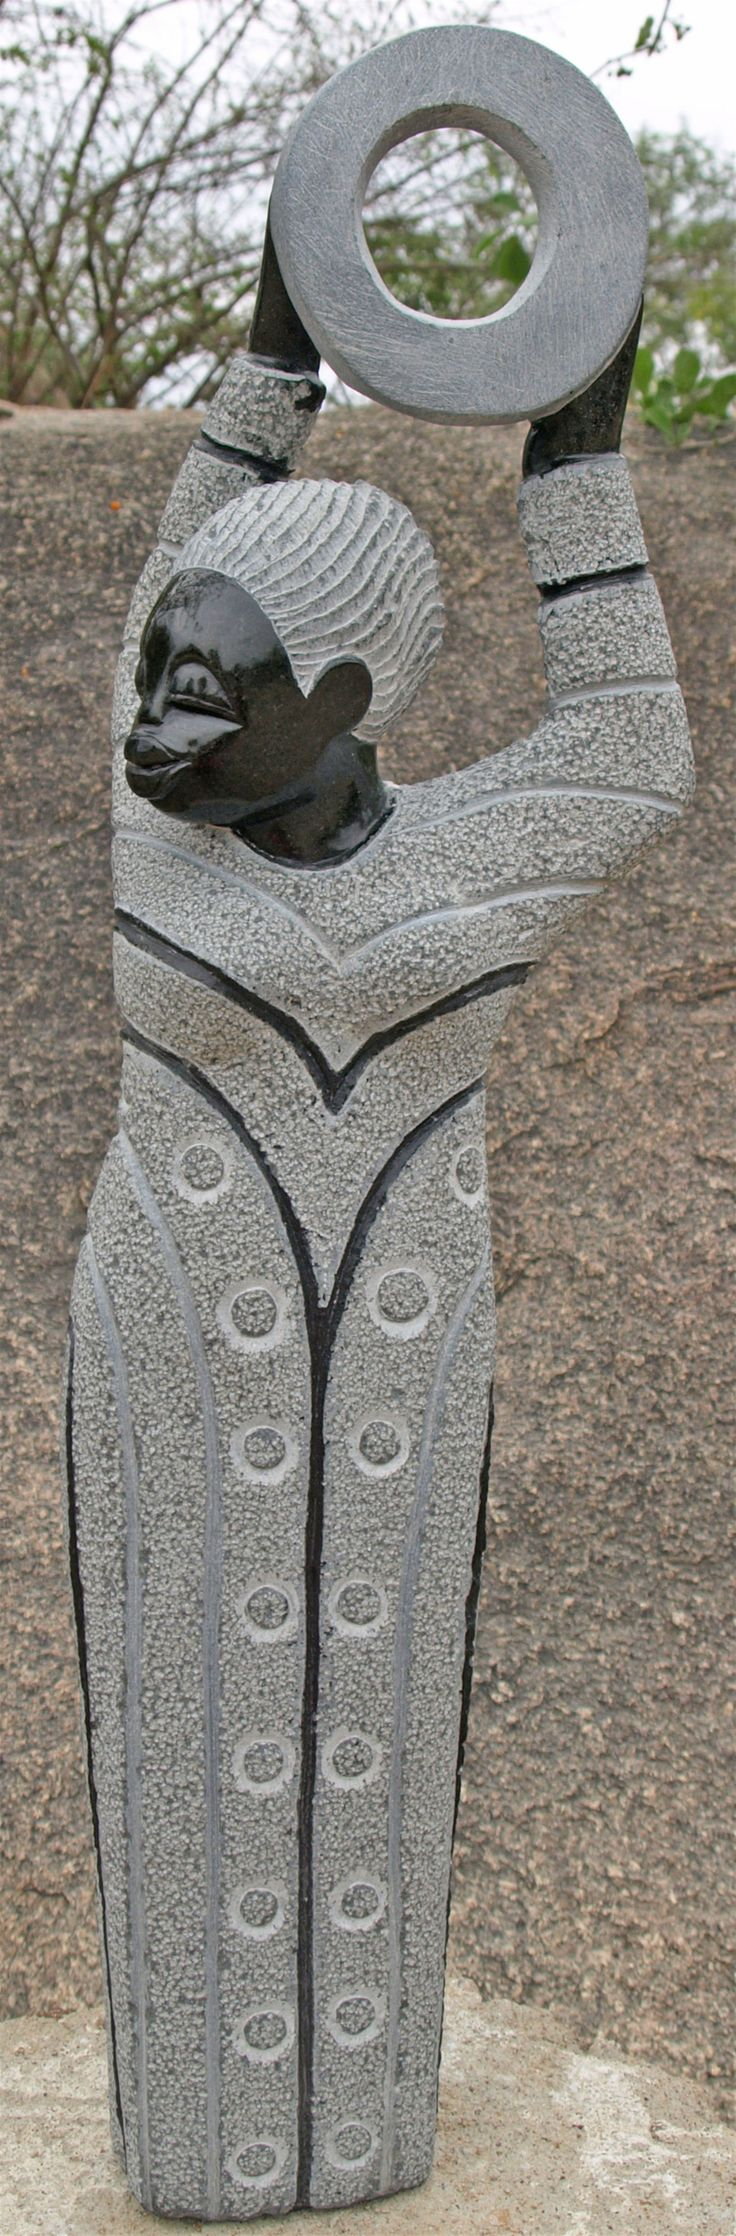 Shona stone sculptures of zimbabwe sculpture